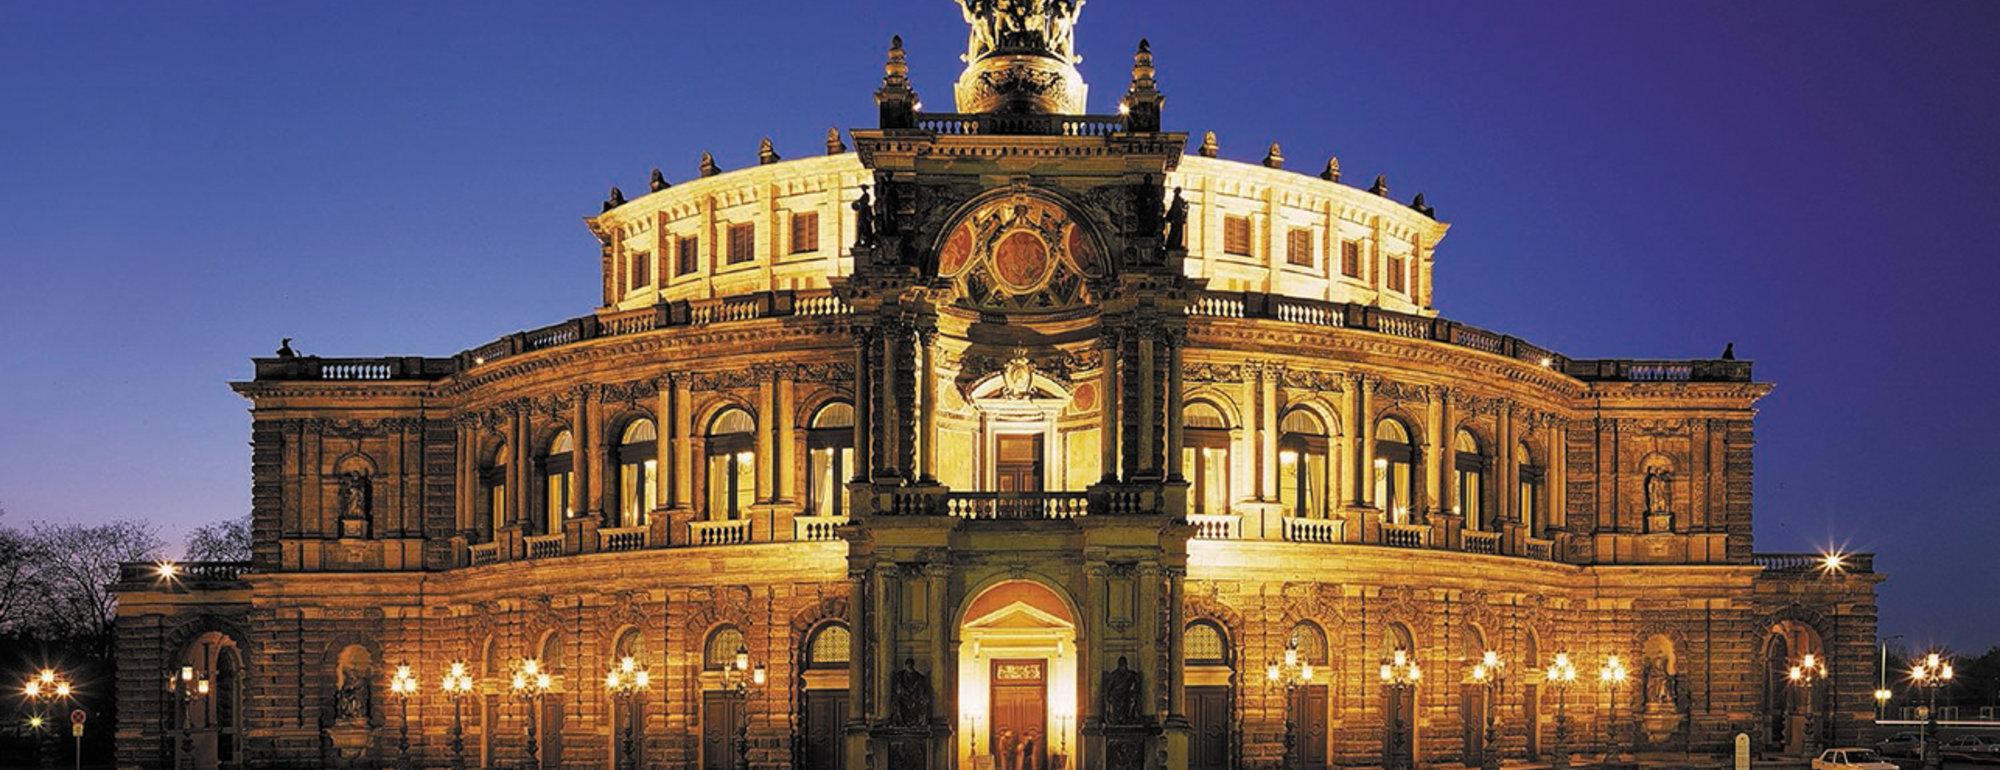 Semper Opera gebouw Dresden